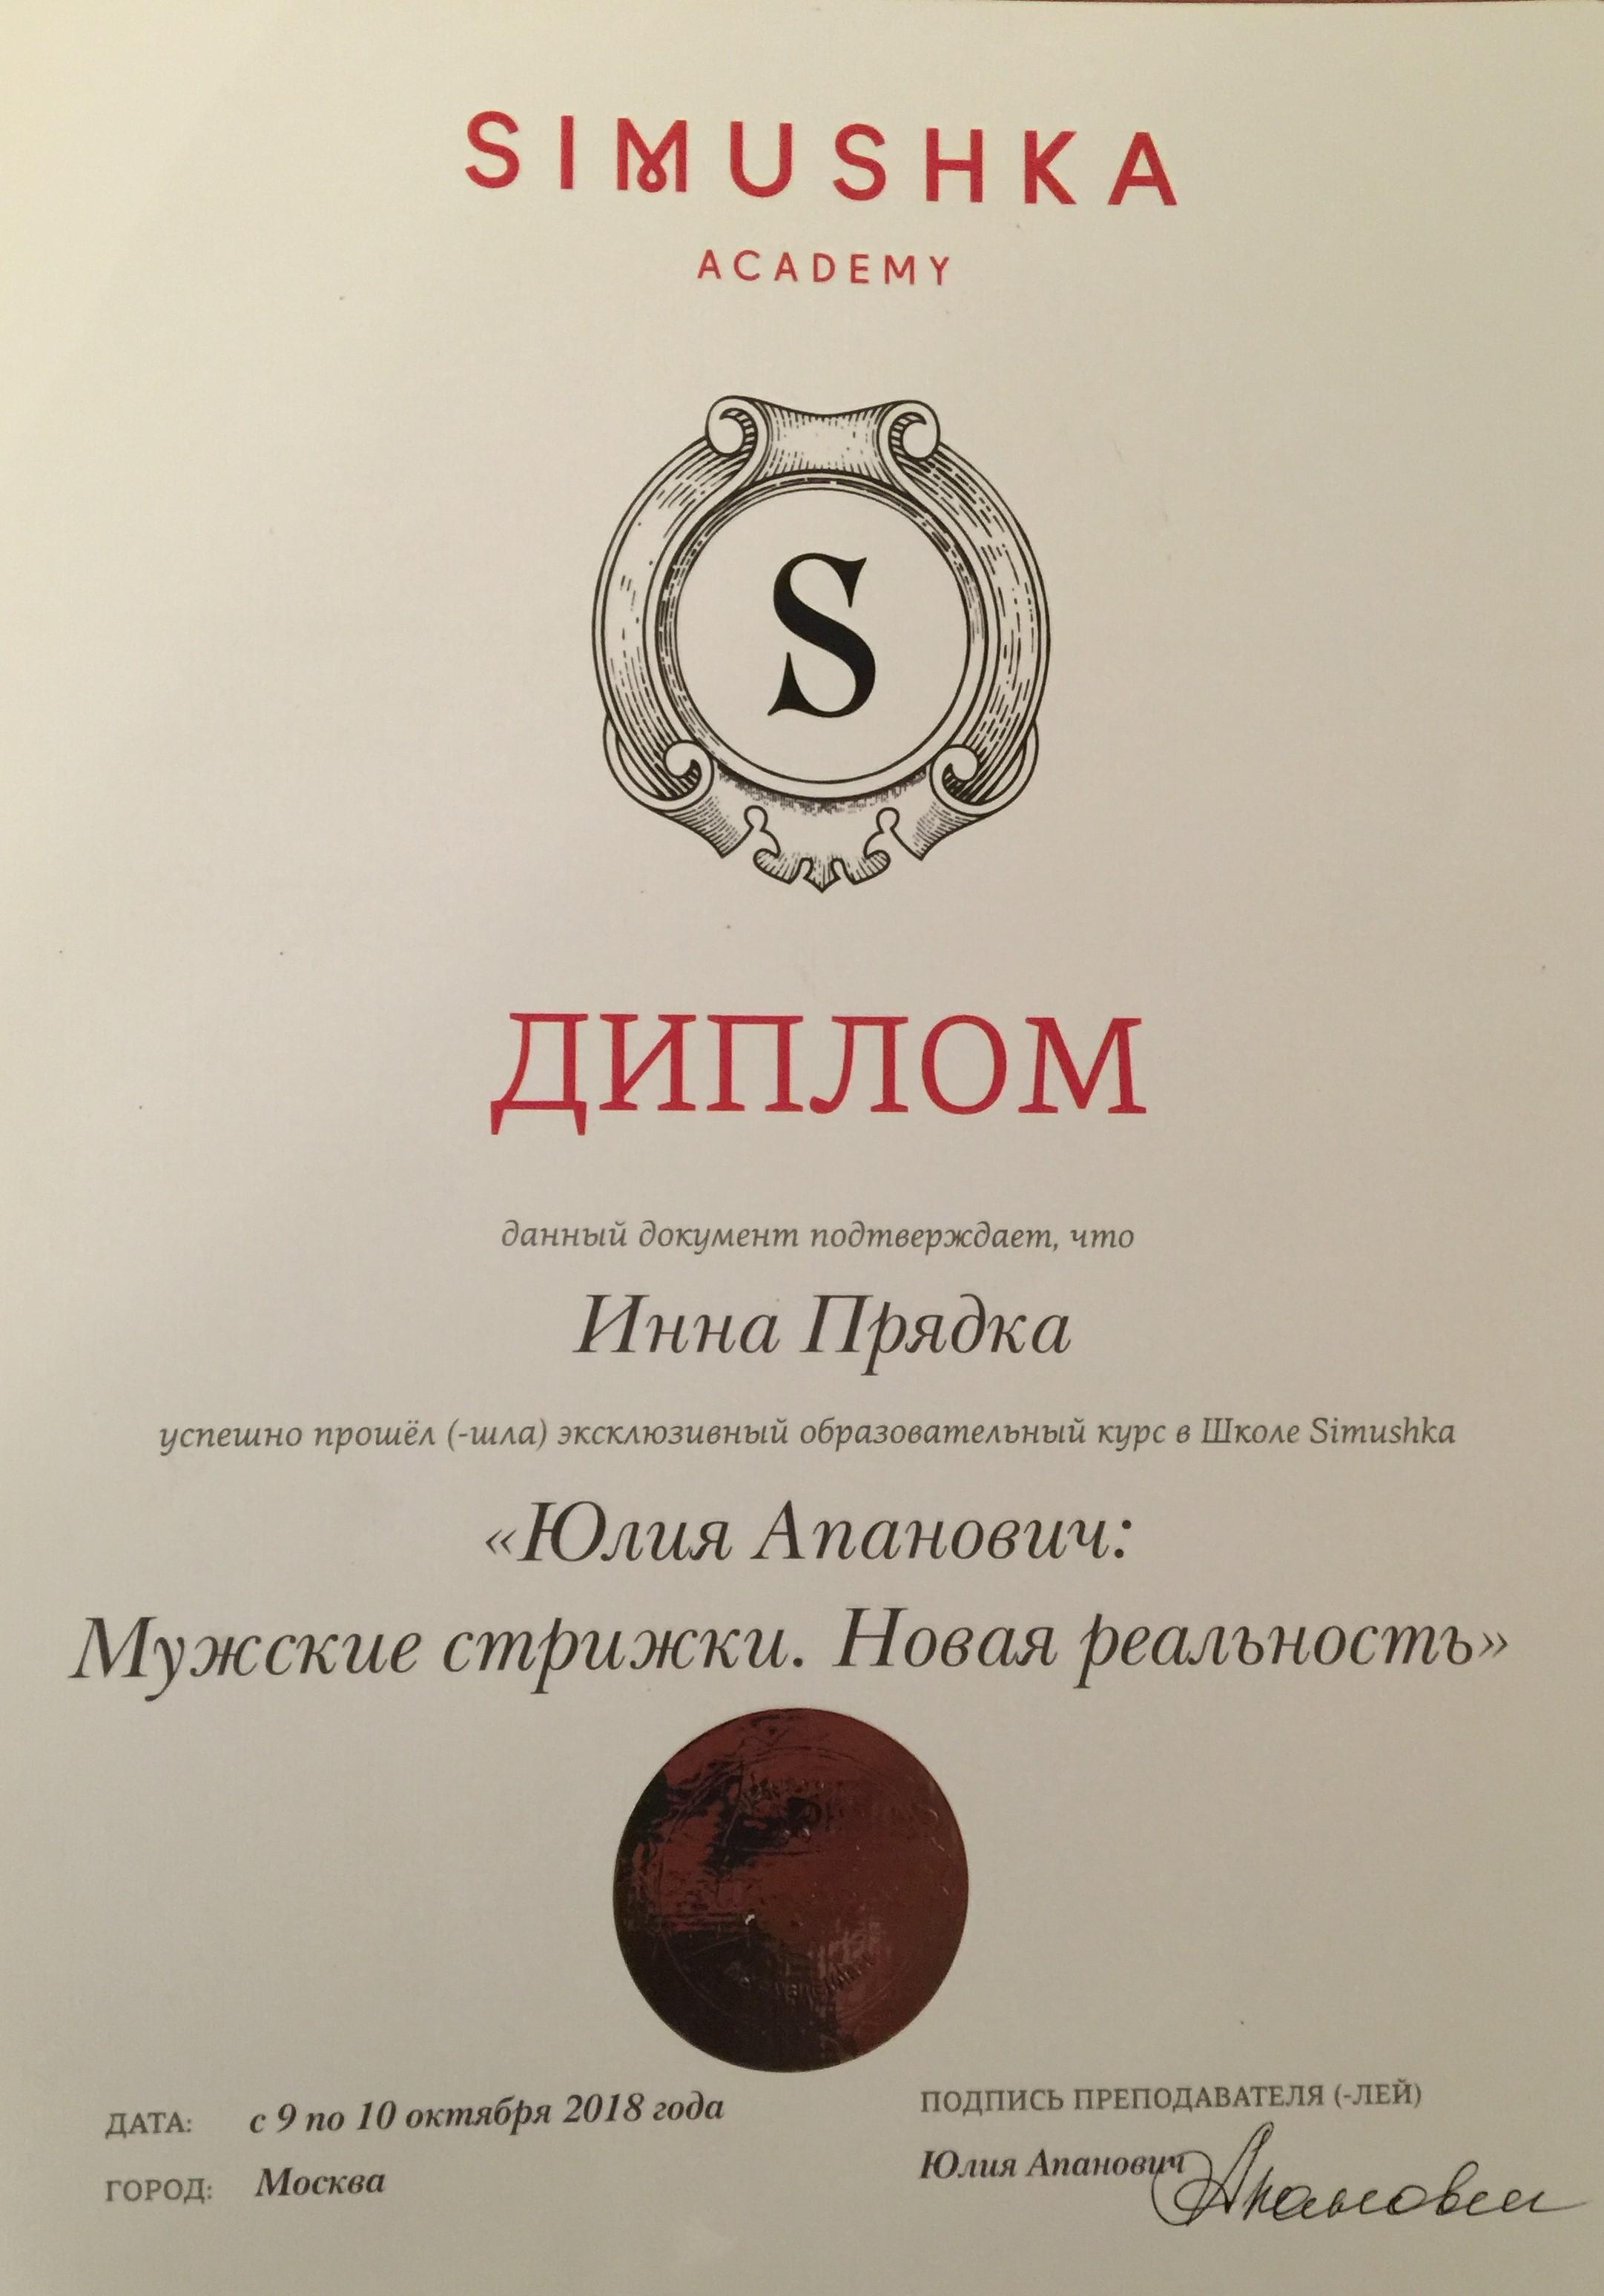 2018, Simushka Academy